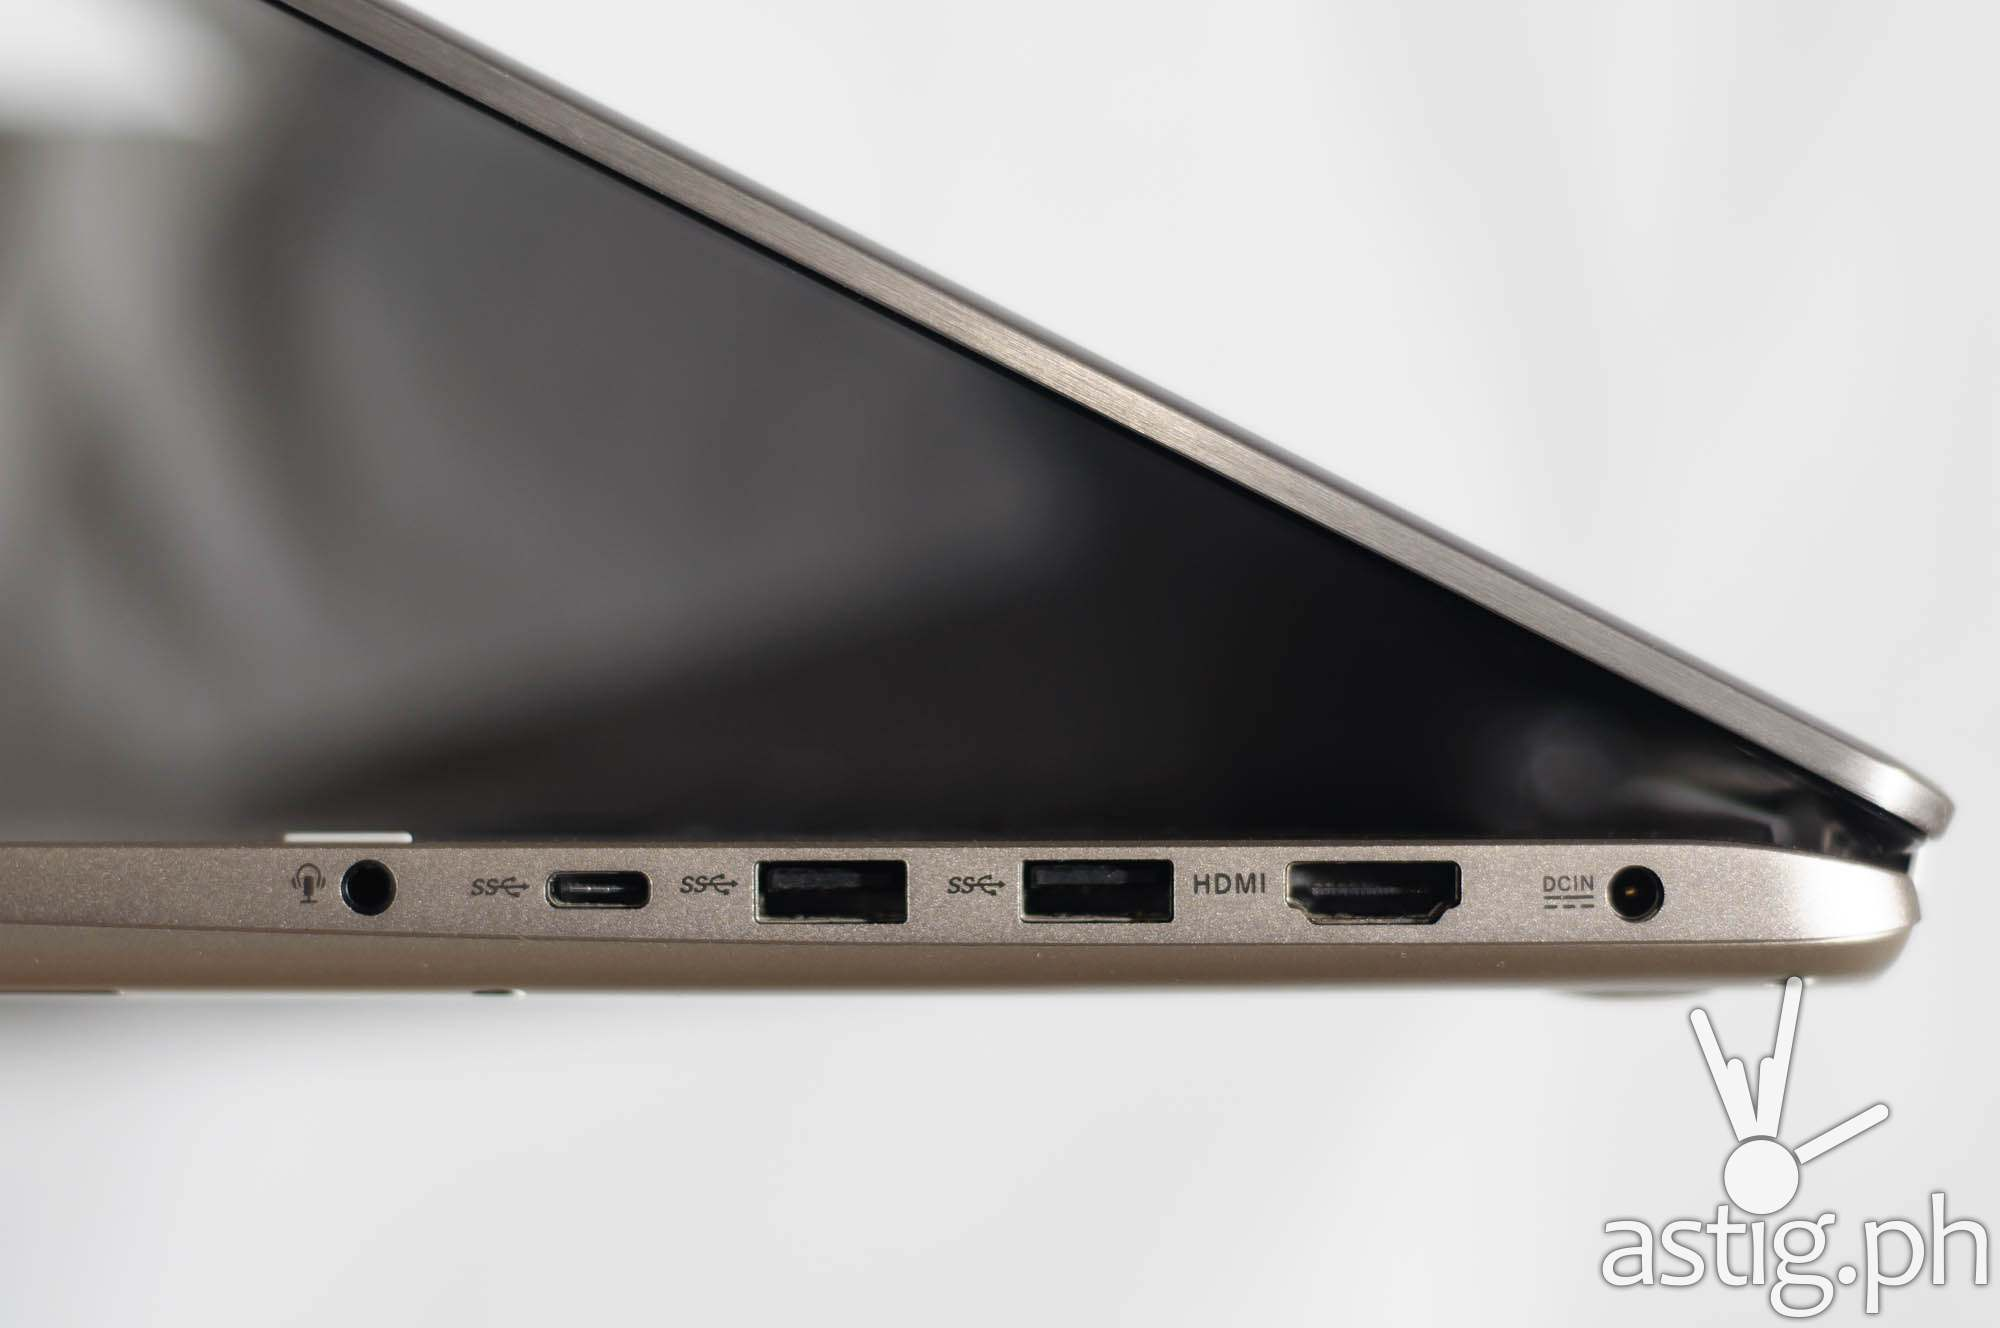 Right: 3.5mm audio port, USB type-C port, 2x USB 3.0 ports, and a standard HDMI port - ASUS ViVoBook Flip TP301UJ